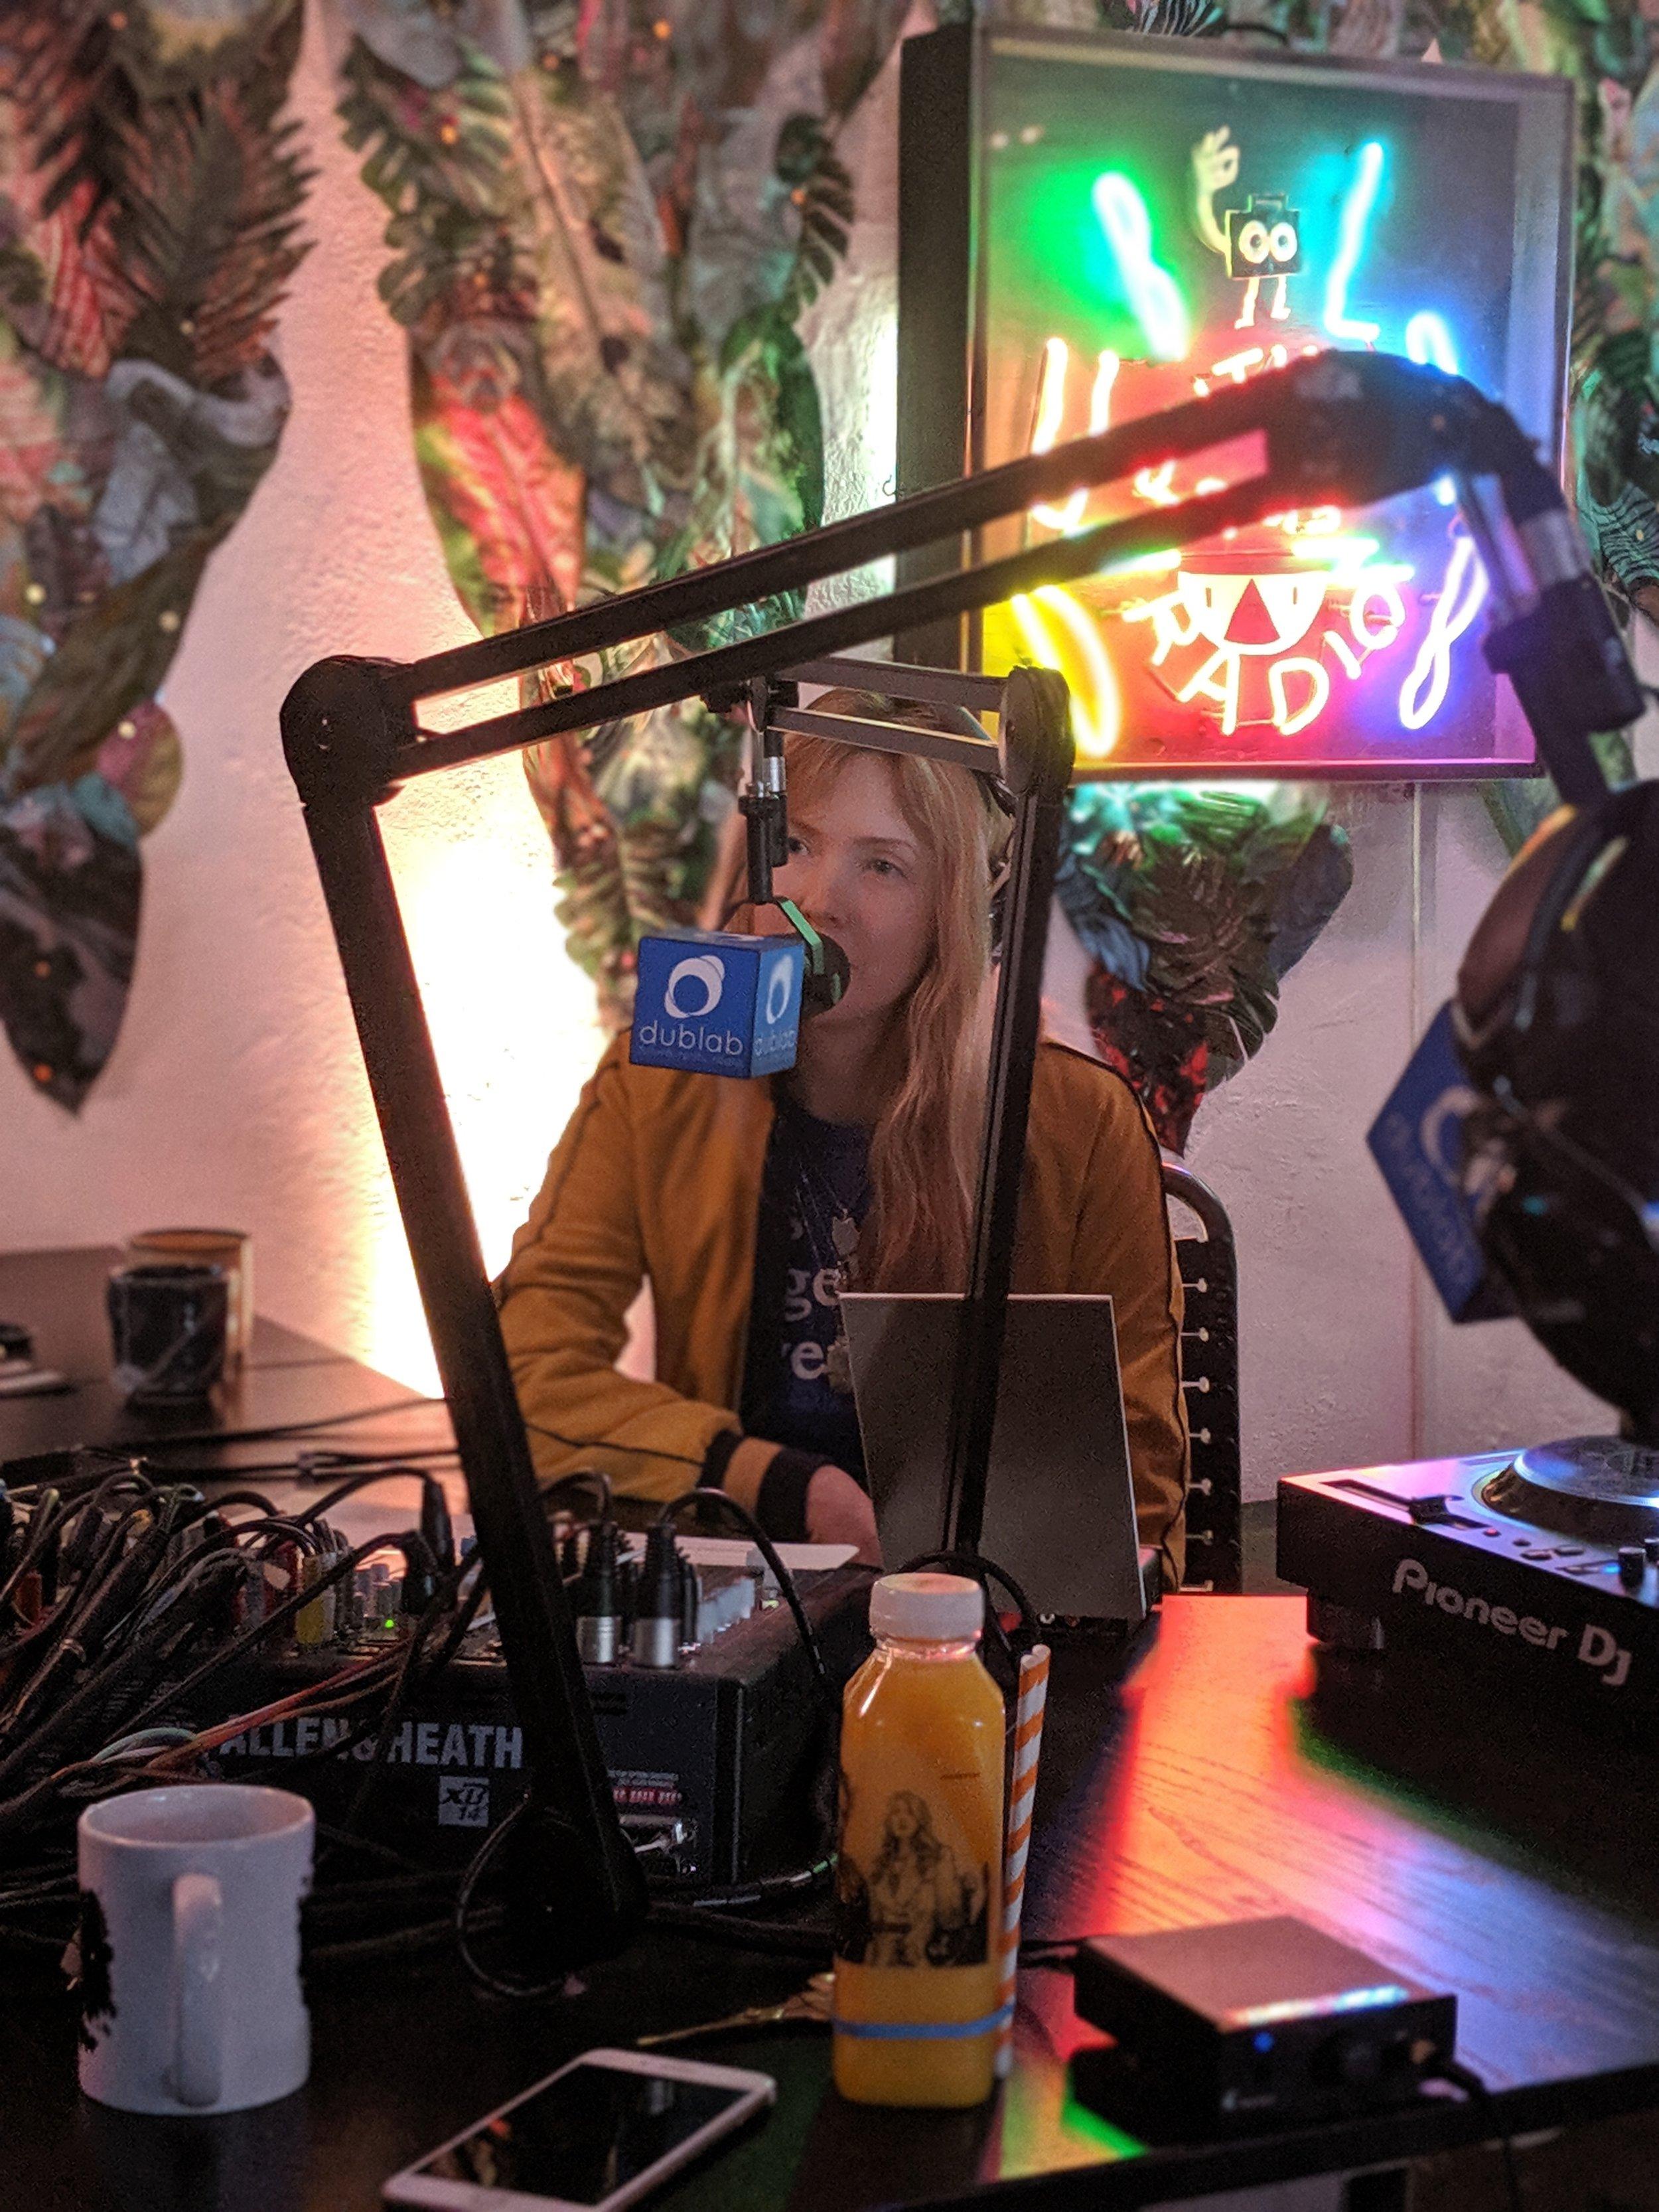 Beatie Wolfe with David Mason at LA's dublab Radio